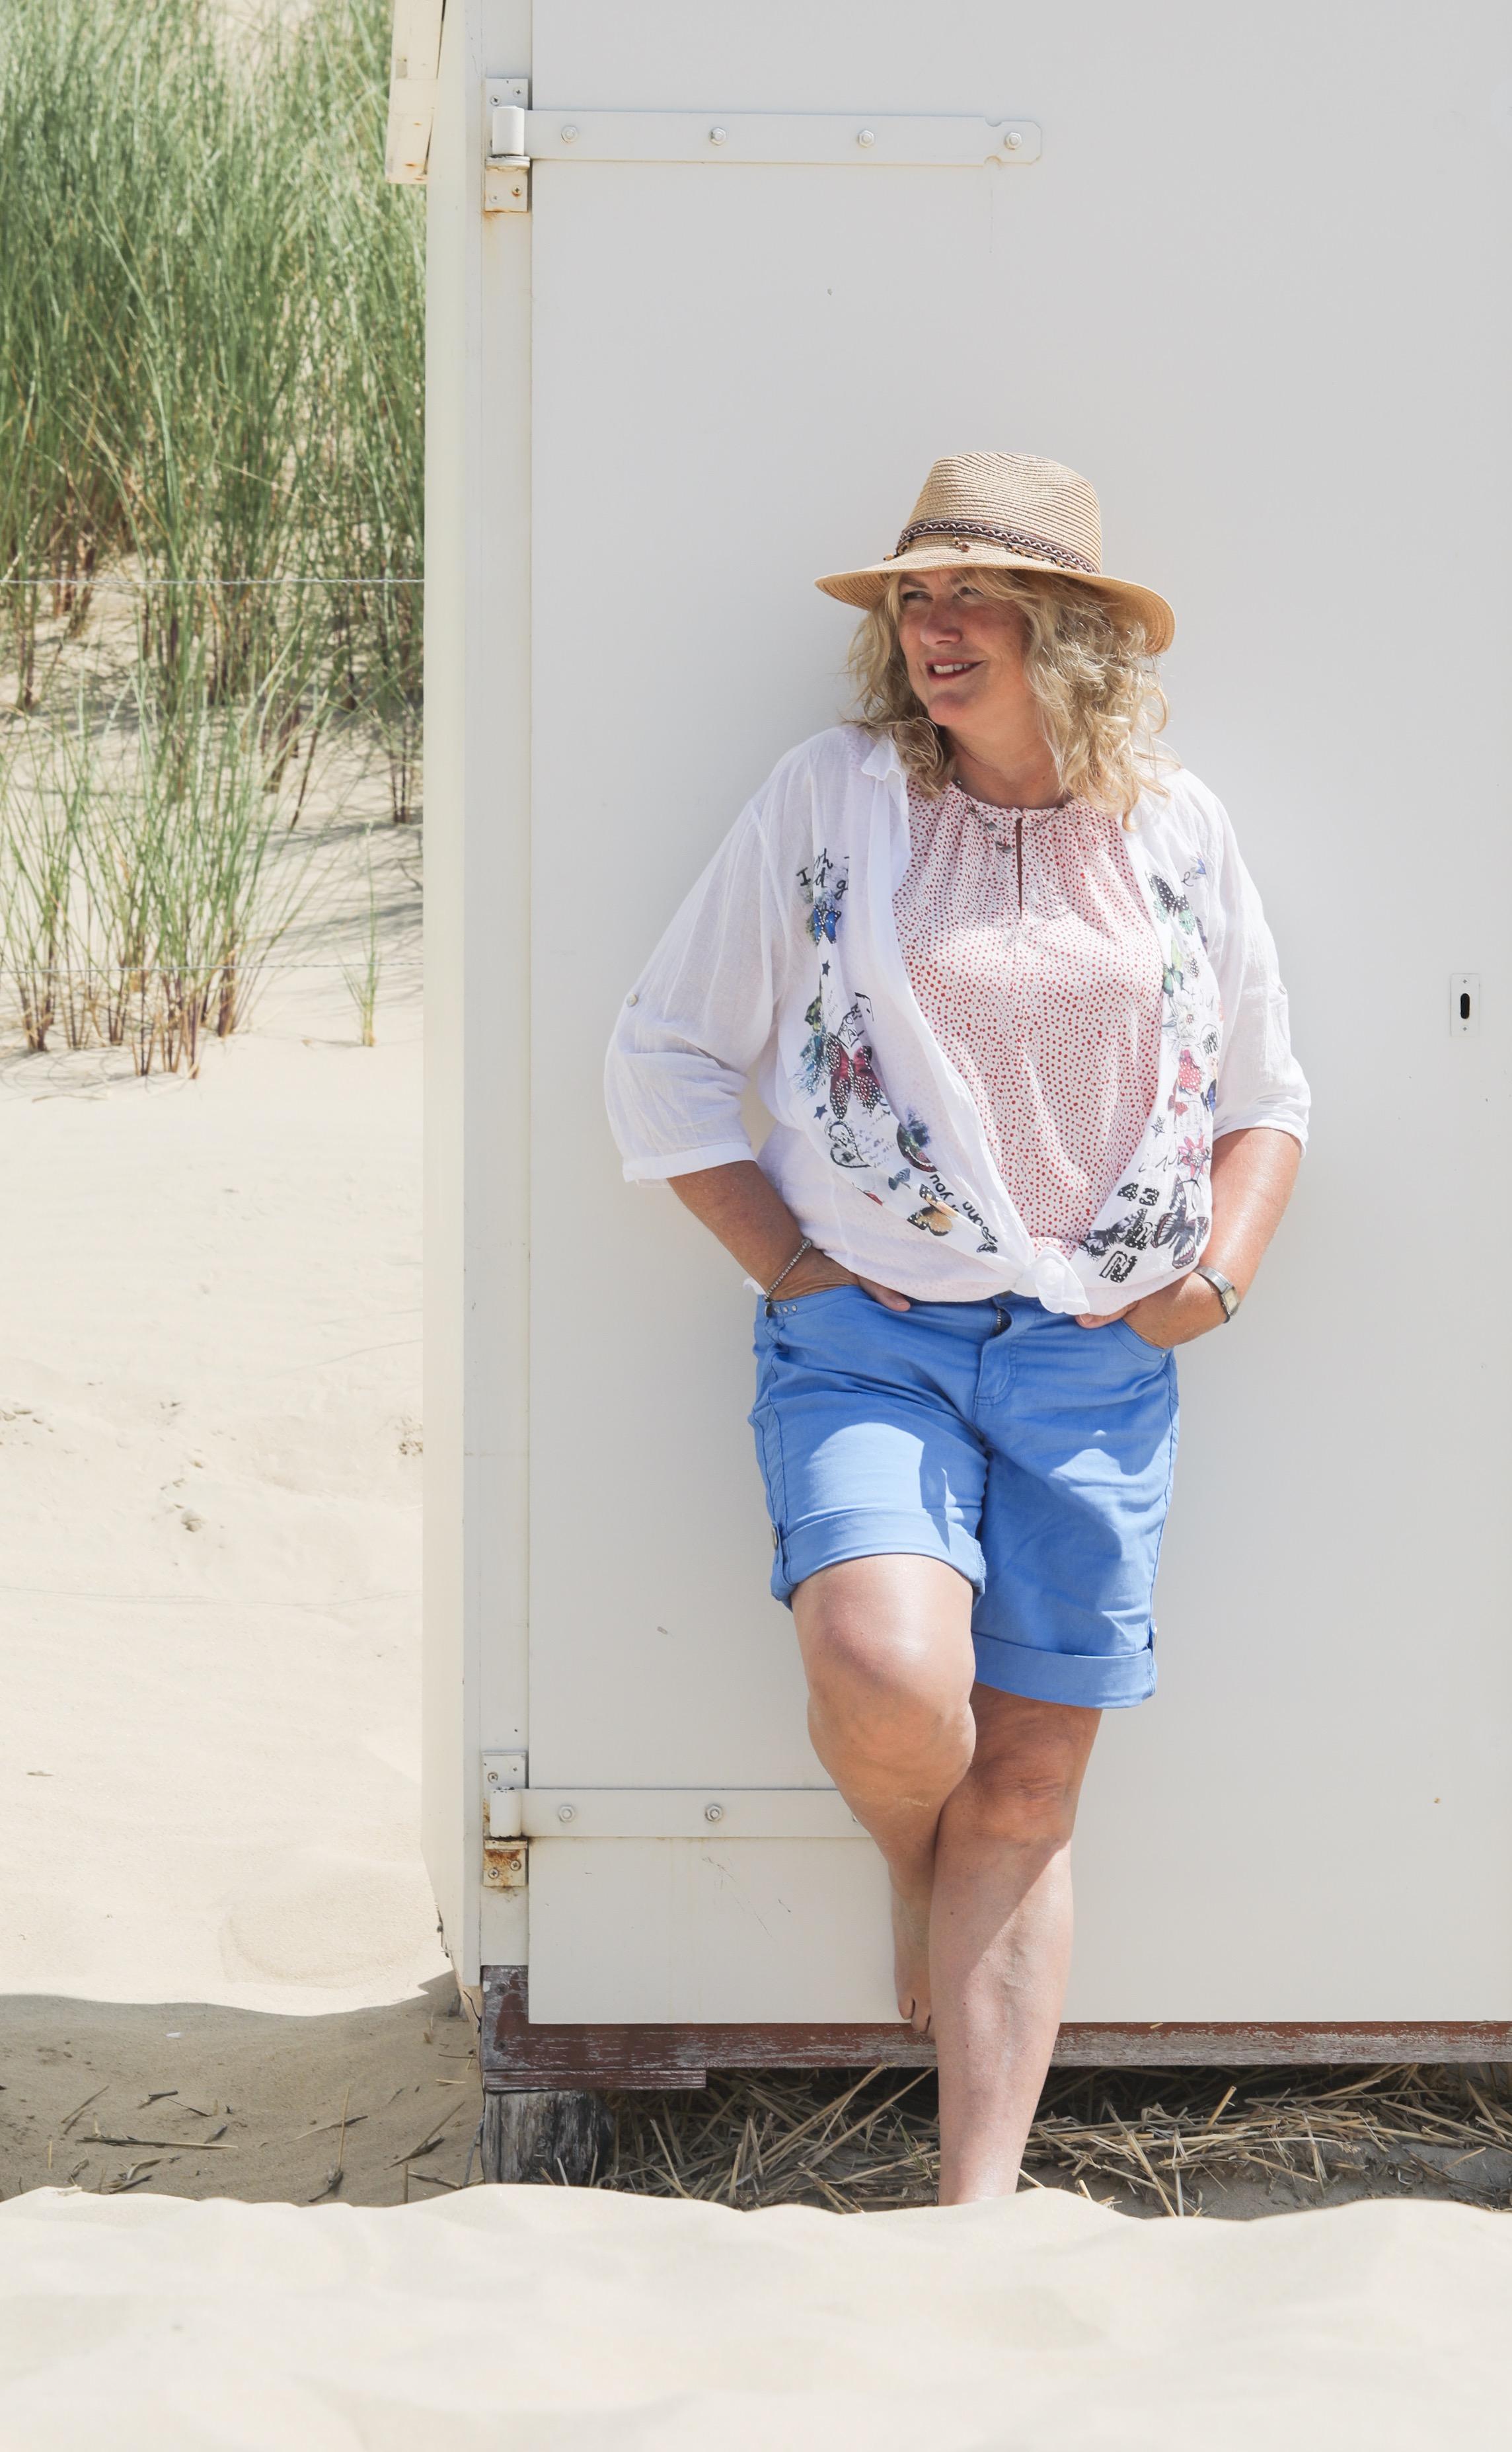 strand strandfoto's buiten lifestyle linkedin design beauty content creatie video videografie foto fotografie 4K bedrijven bedrijfsvideo bedrijfsfoto promotie- RSDesigns